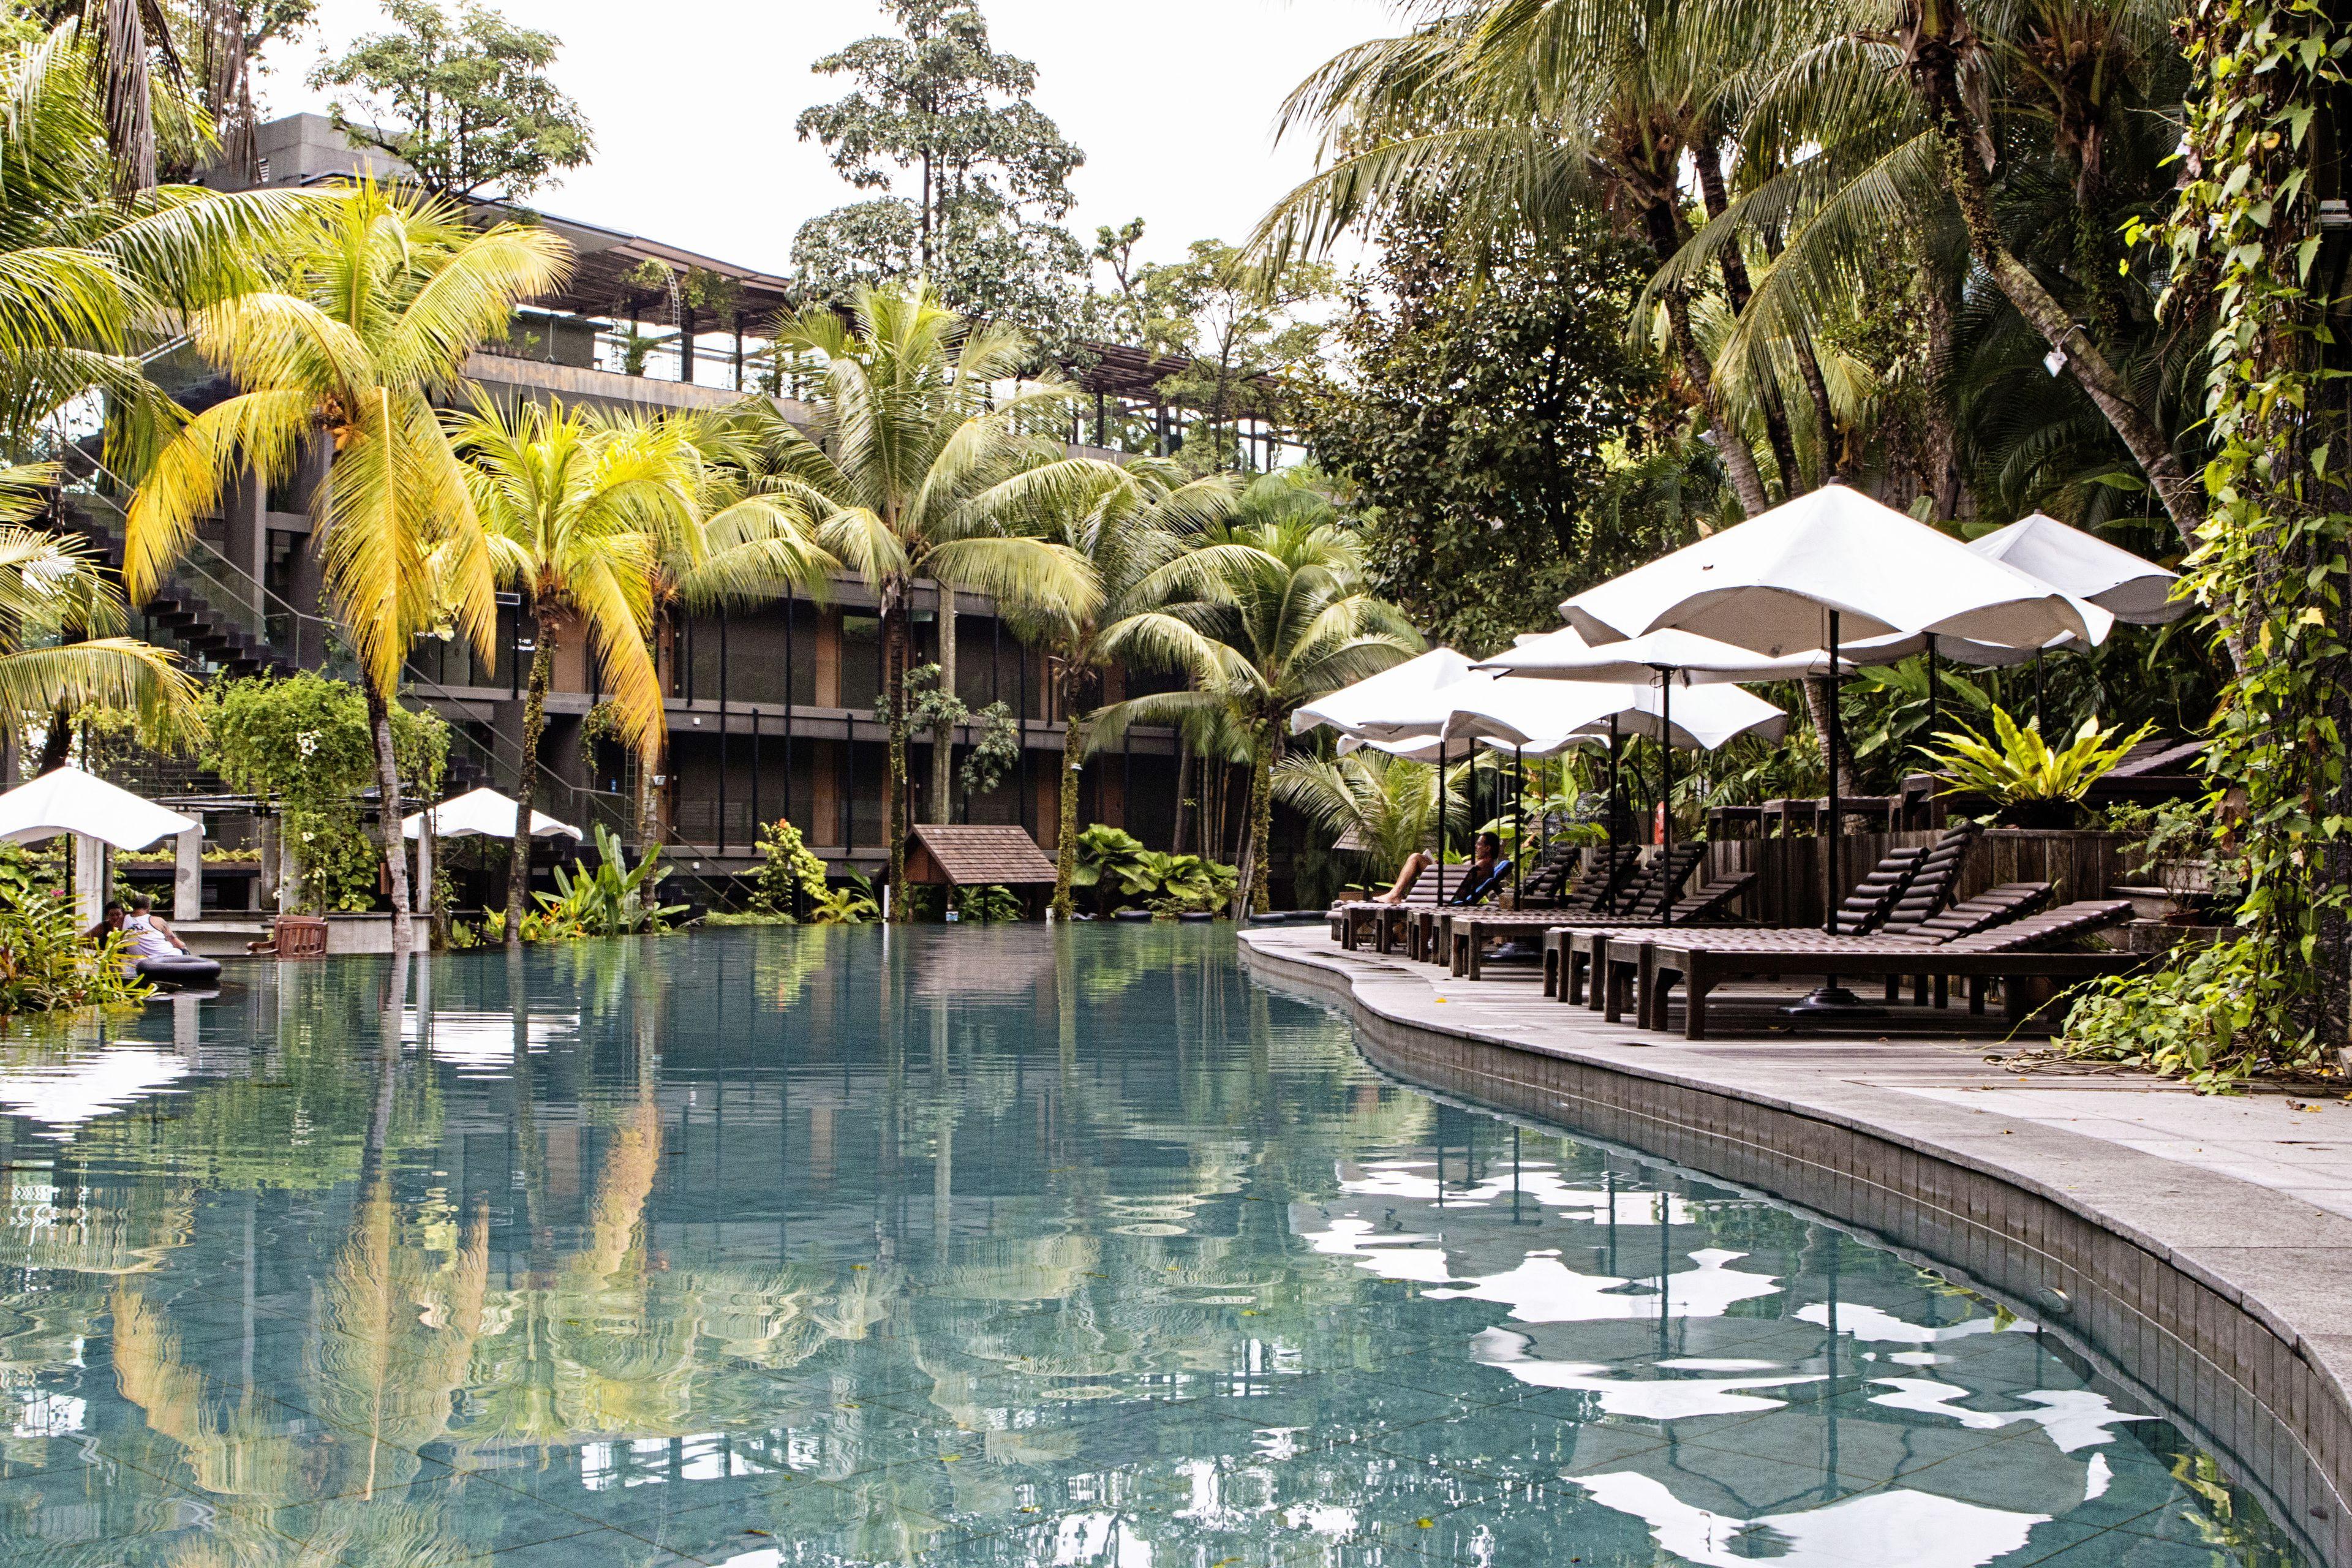 Singapore_Siloso_Beach_Resort1.jpg?1555438504